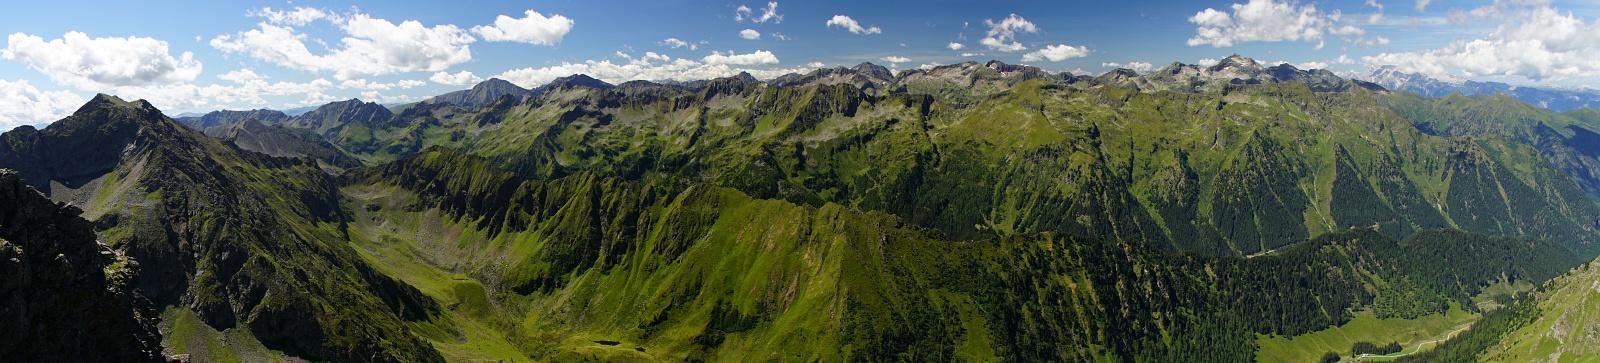 Panoramablick Richtung Westen (Klick zur Vergrößerung)